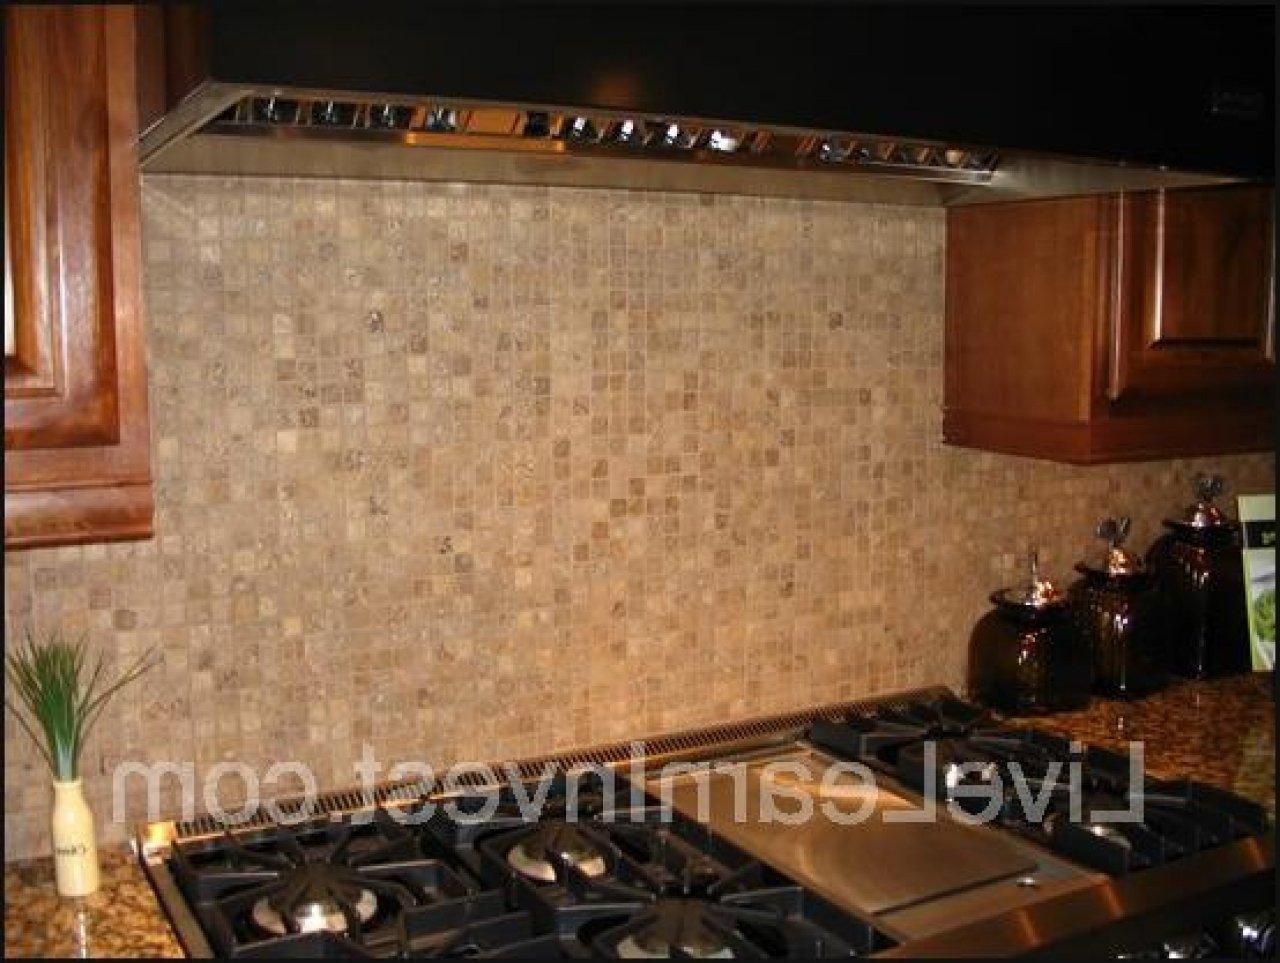 Beau Of Kitchen Backsplash Design Ideas Backsplash Wallpaper In Kitchen 1280x963